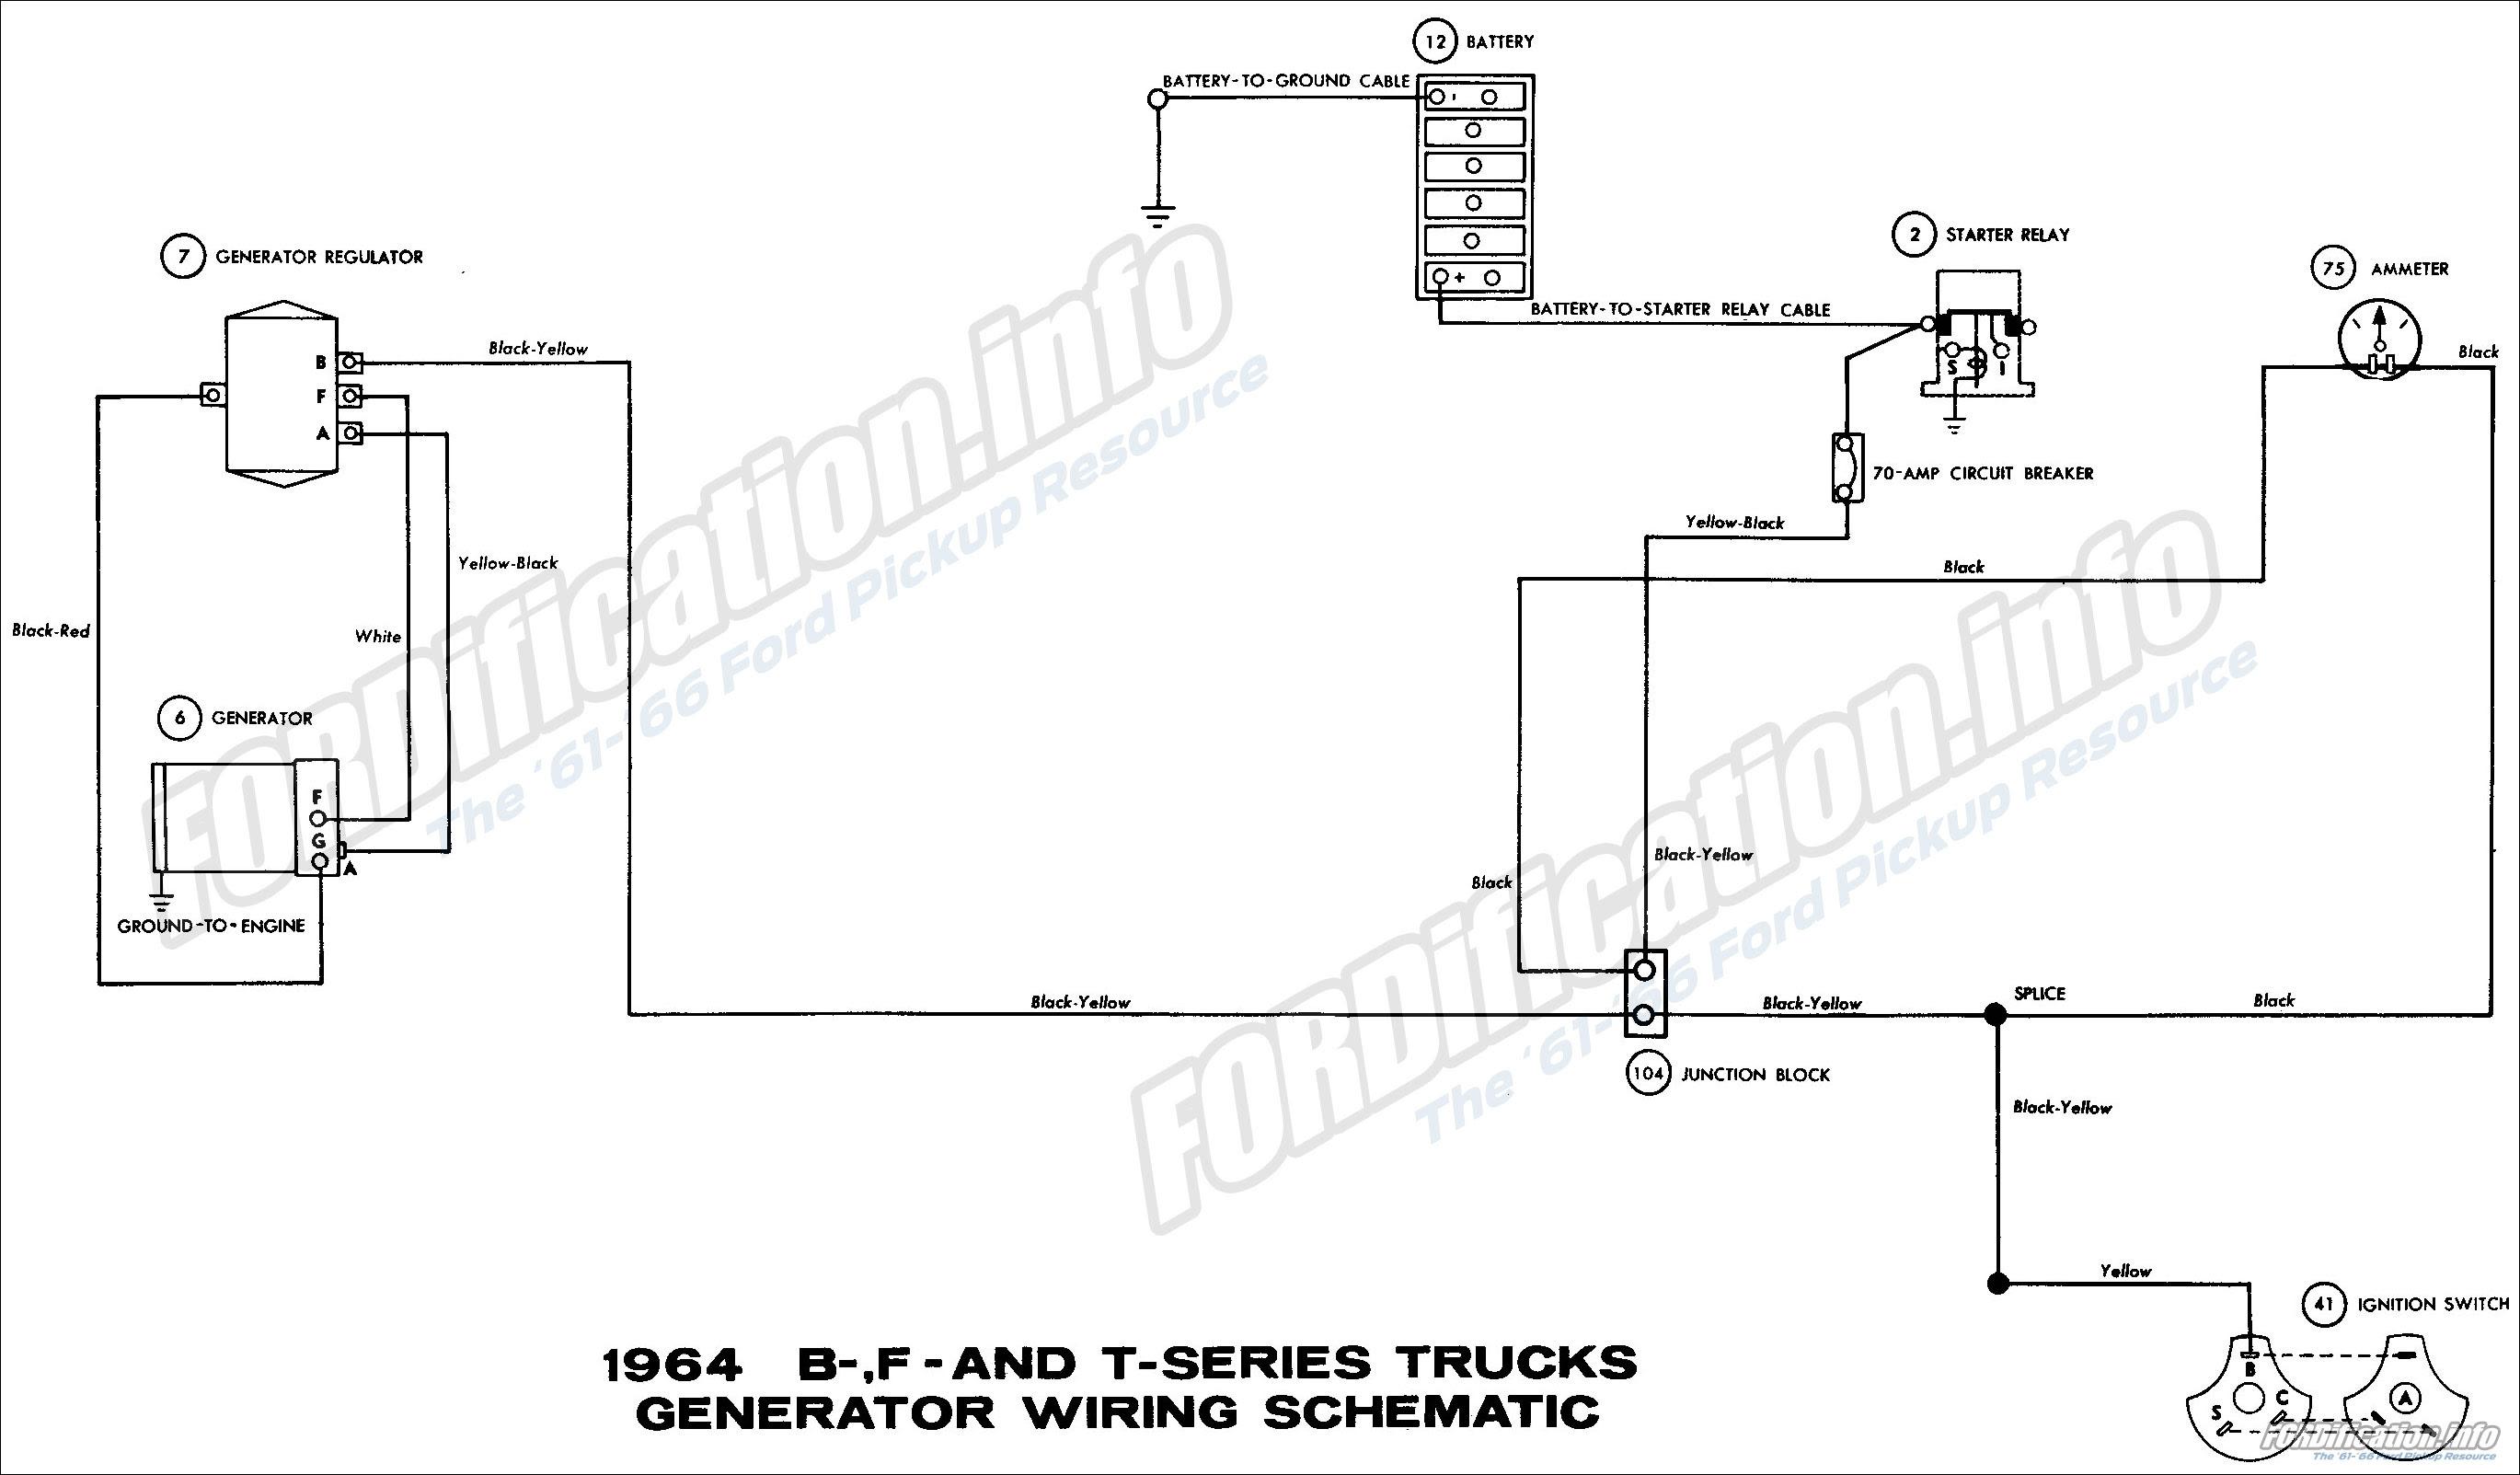 41 Ford Headlight Switch Wiring Diagram Wiring Diagram United3 United3 Maceratadoc It